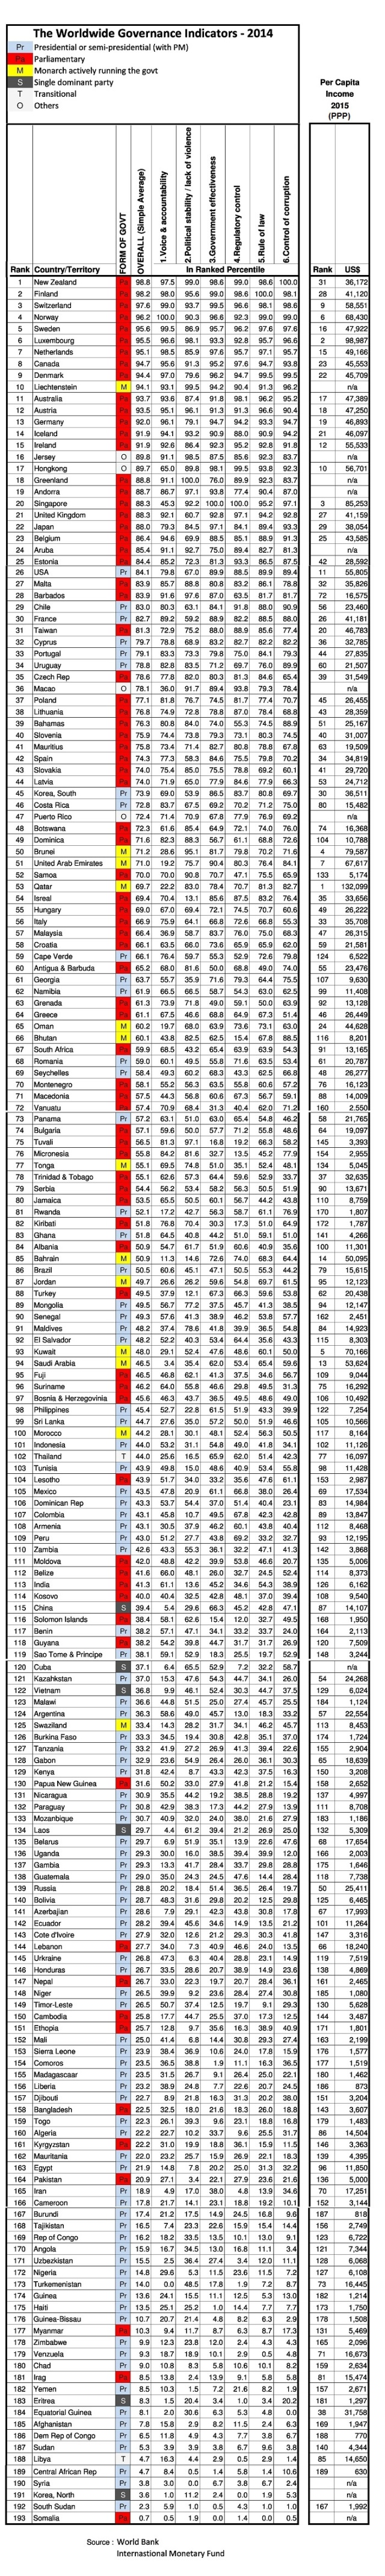 good-govt-ranking